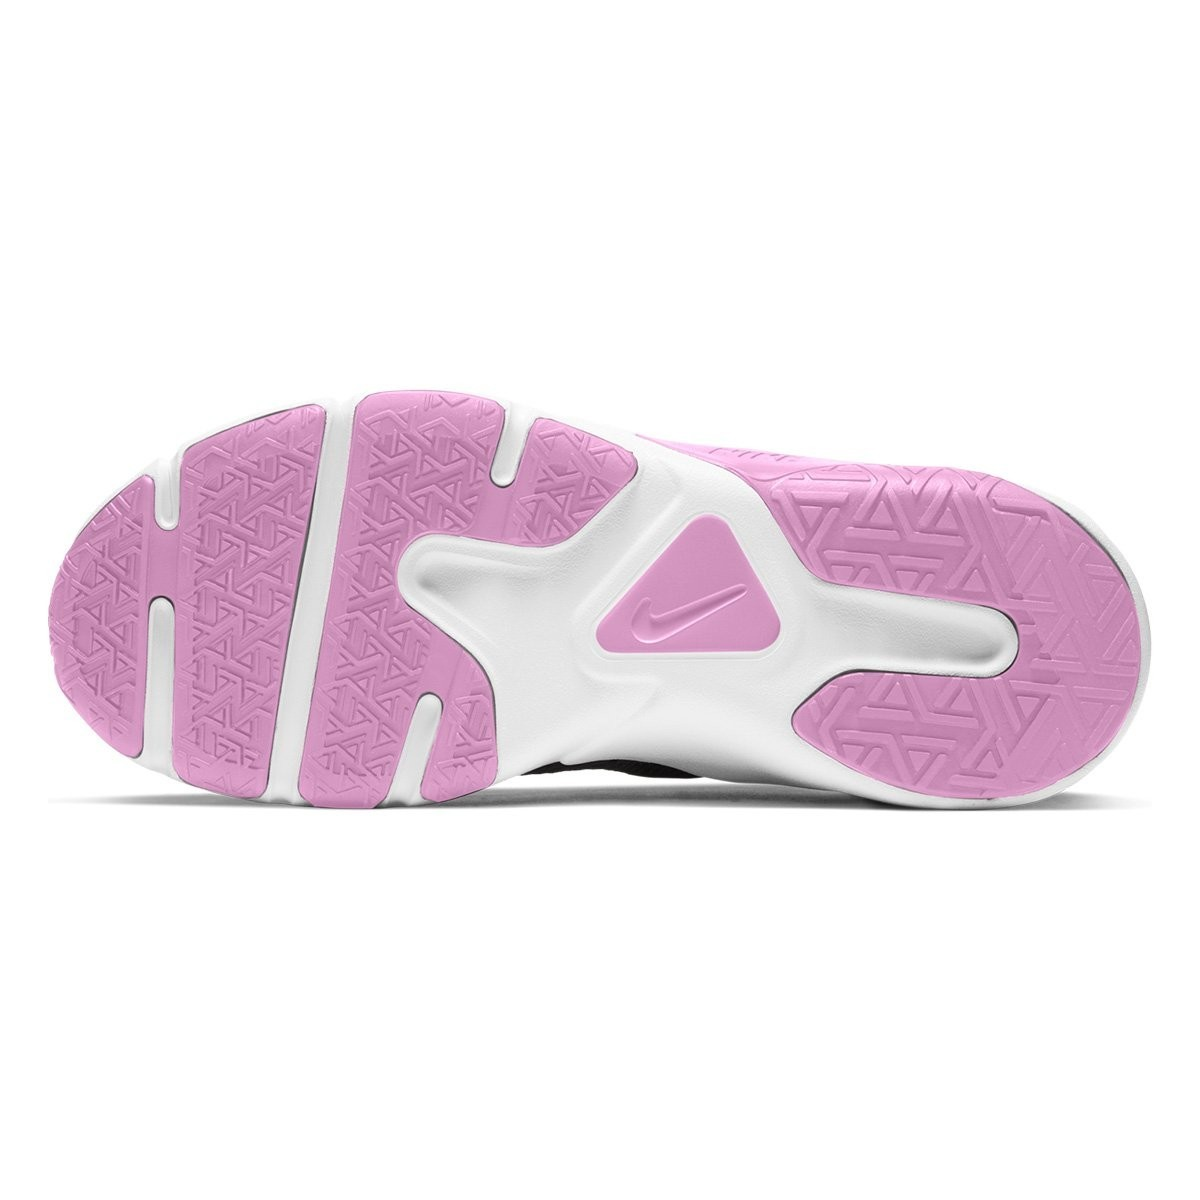 Tenis Esportivo Feminino Nike Legend Essential Preto/Rosa